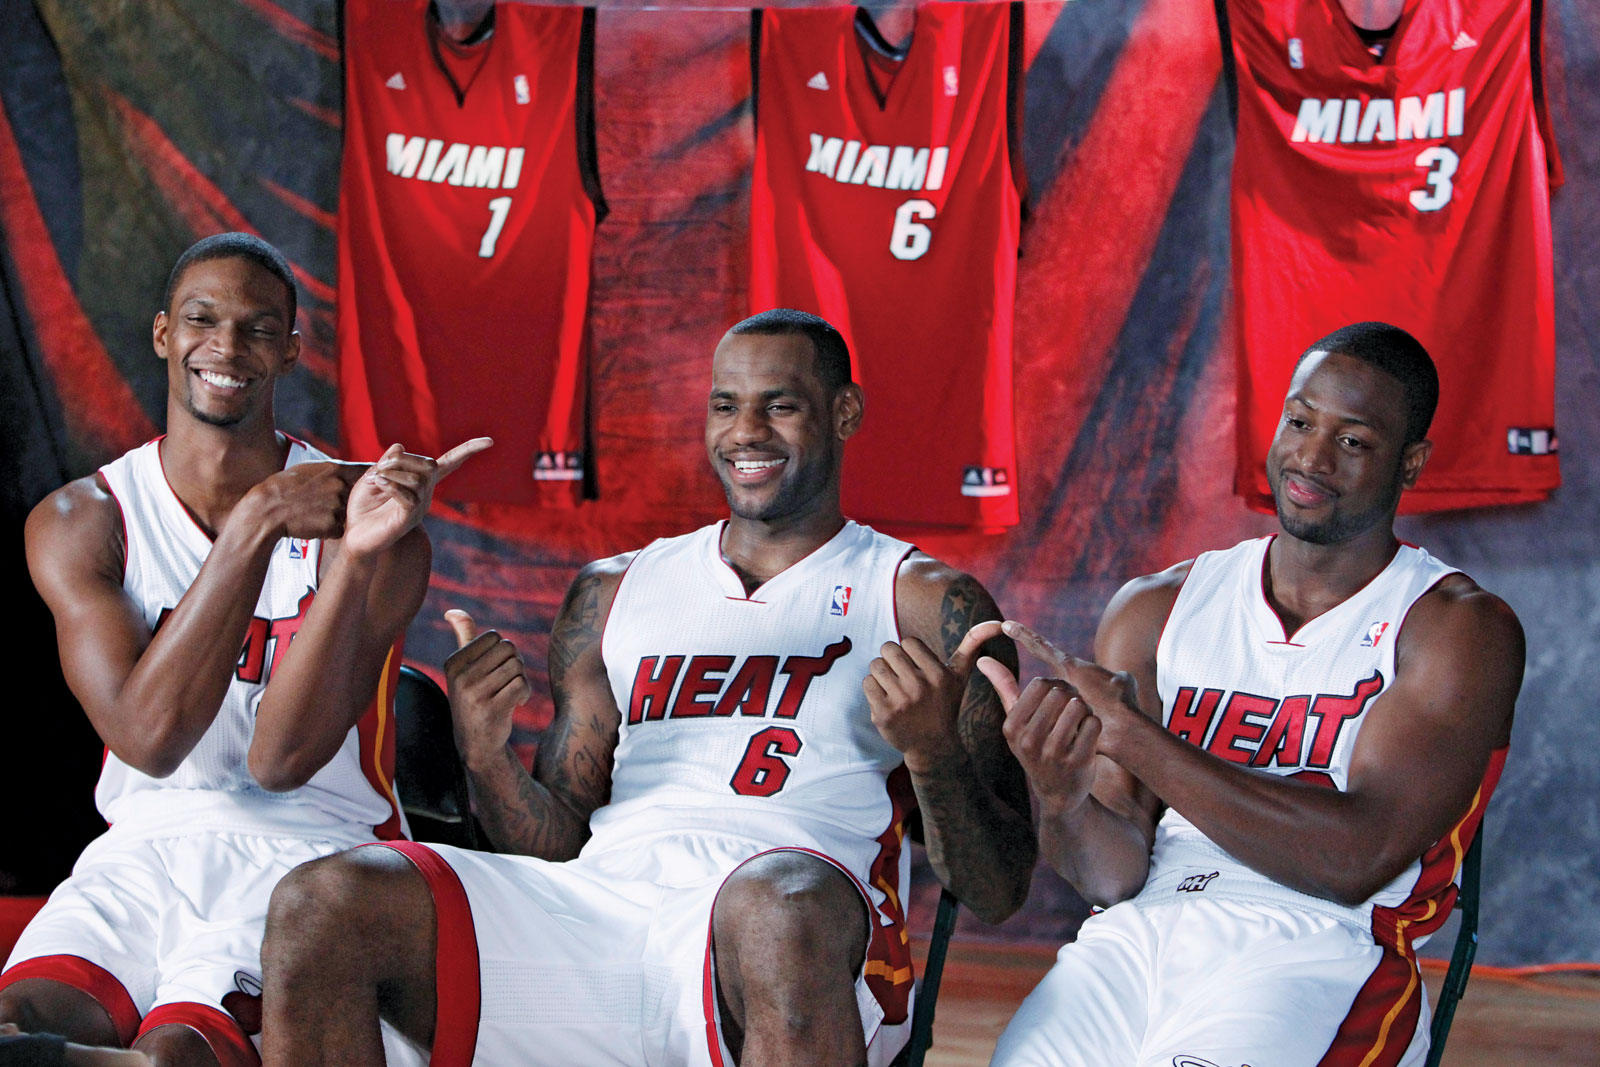 LeBron, Wade and Bosh